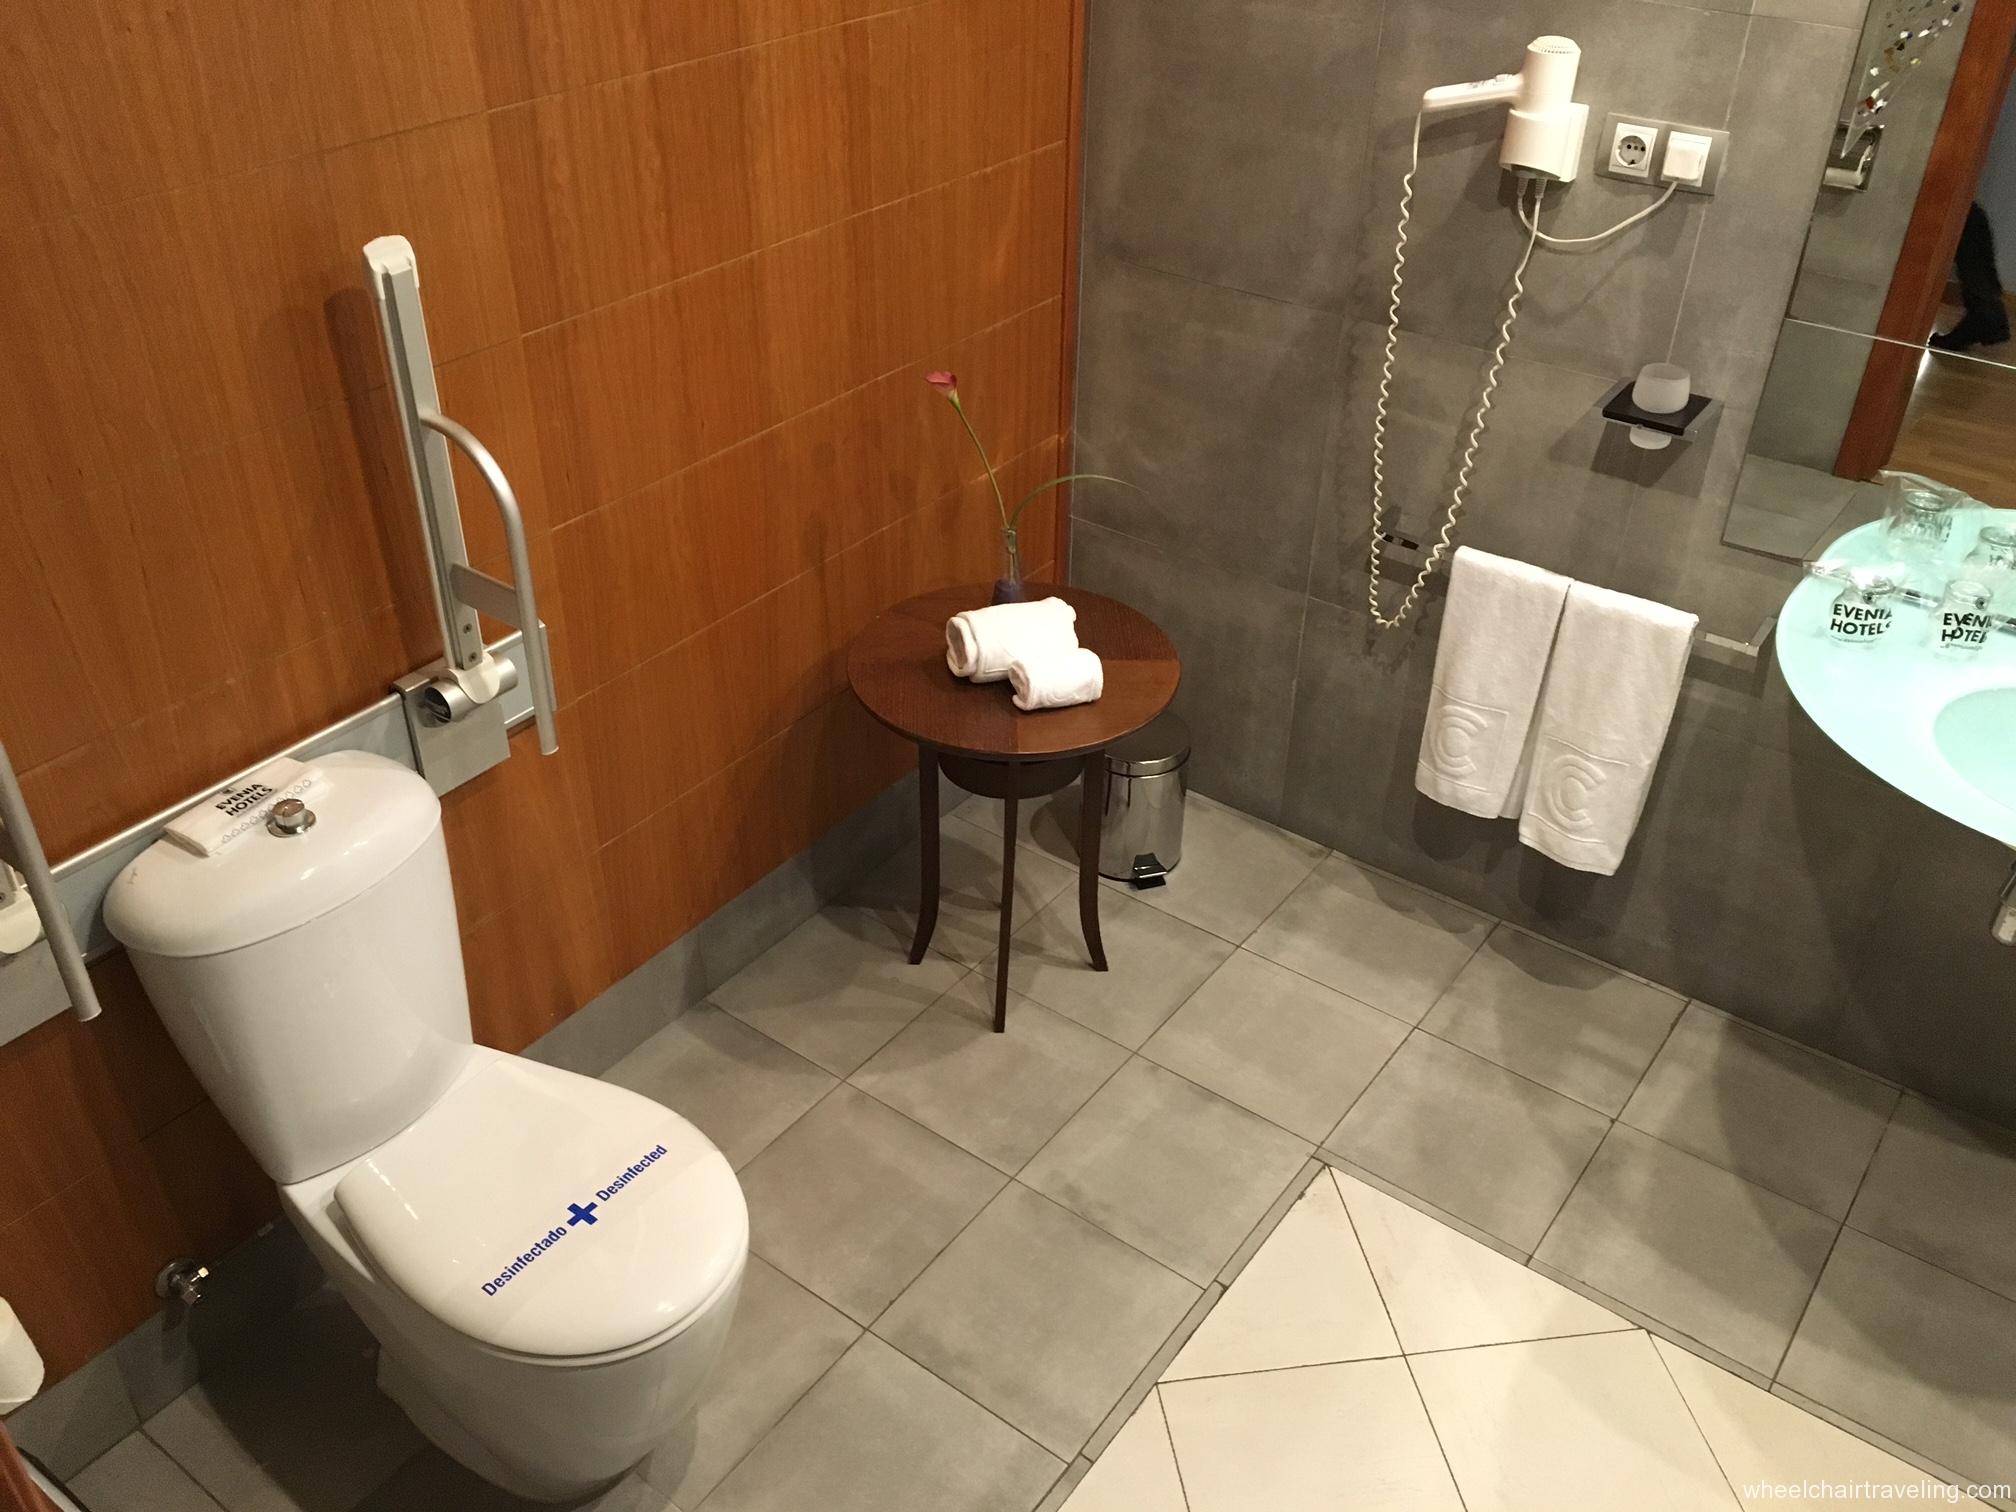 Barcelona hotel bathroom toilet